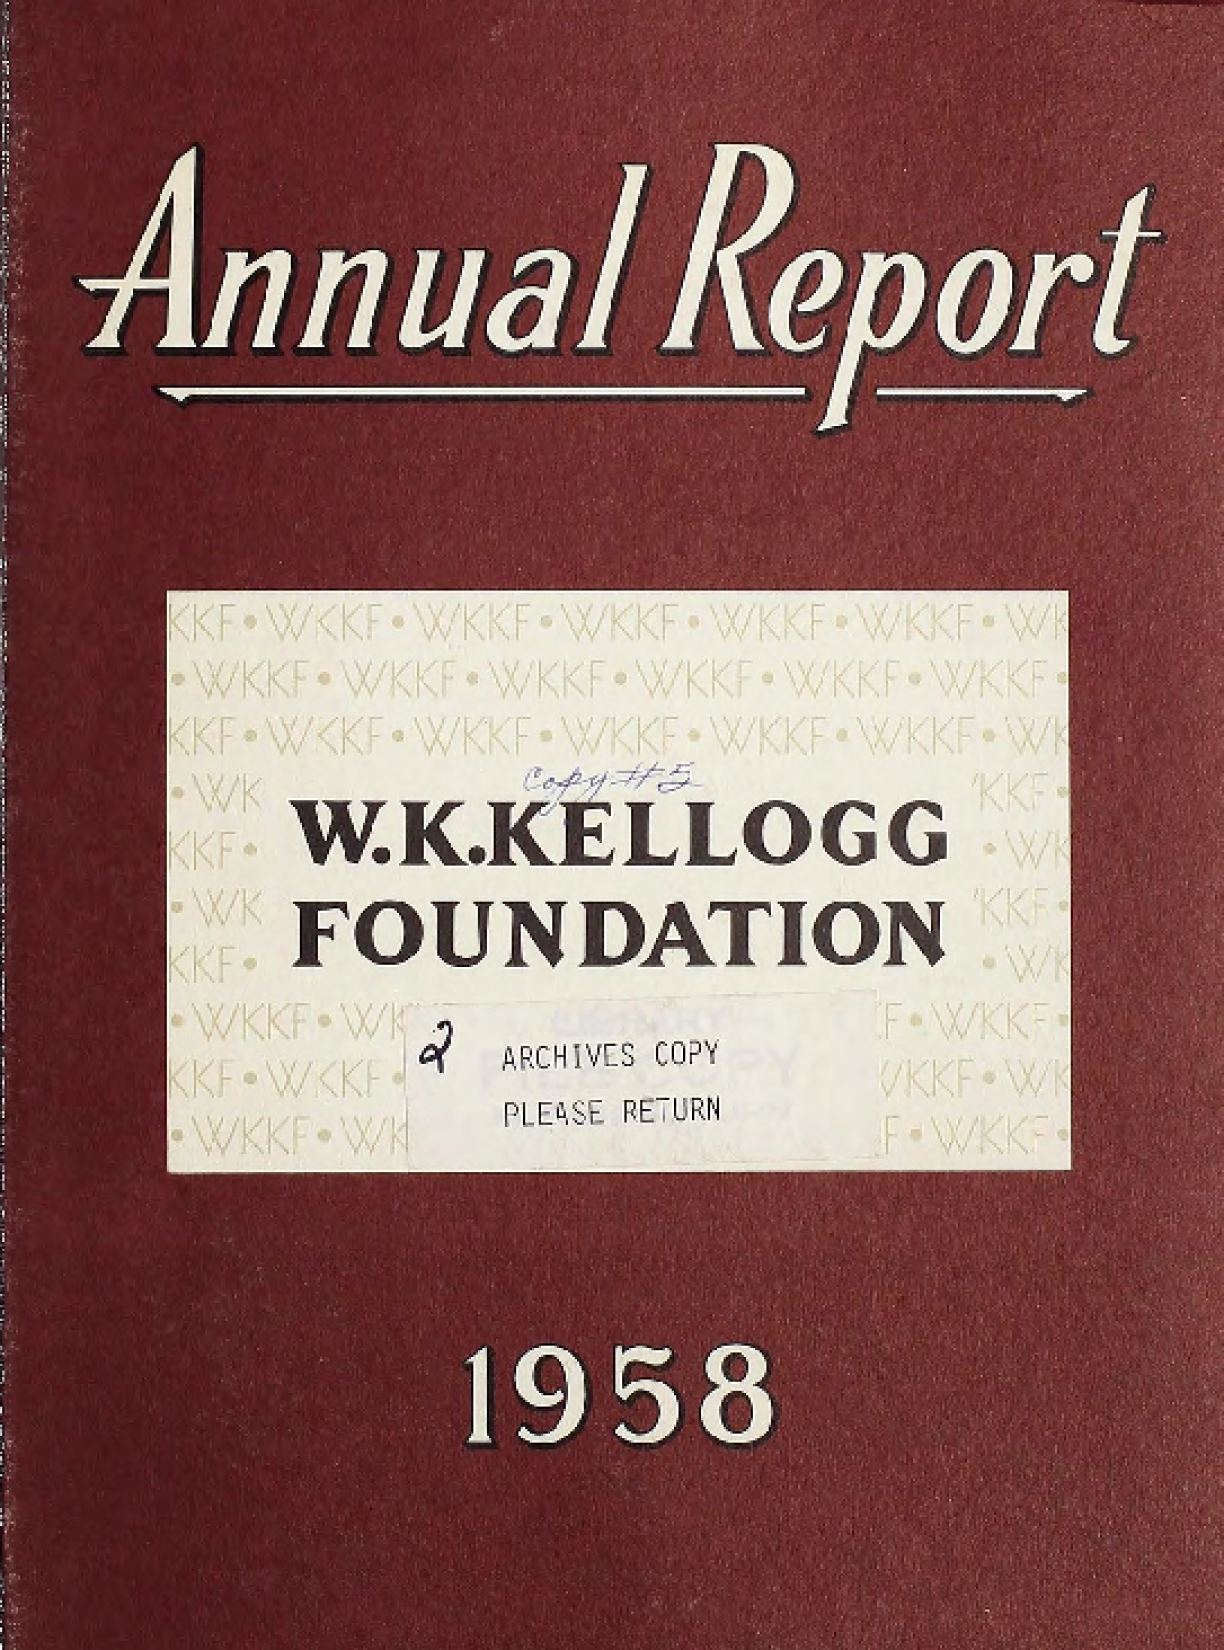 1958 W.K. Kellogg Annual Report